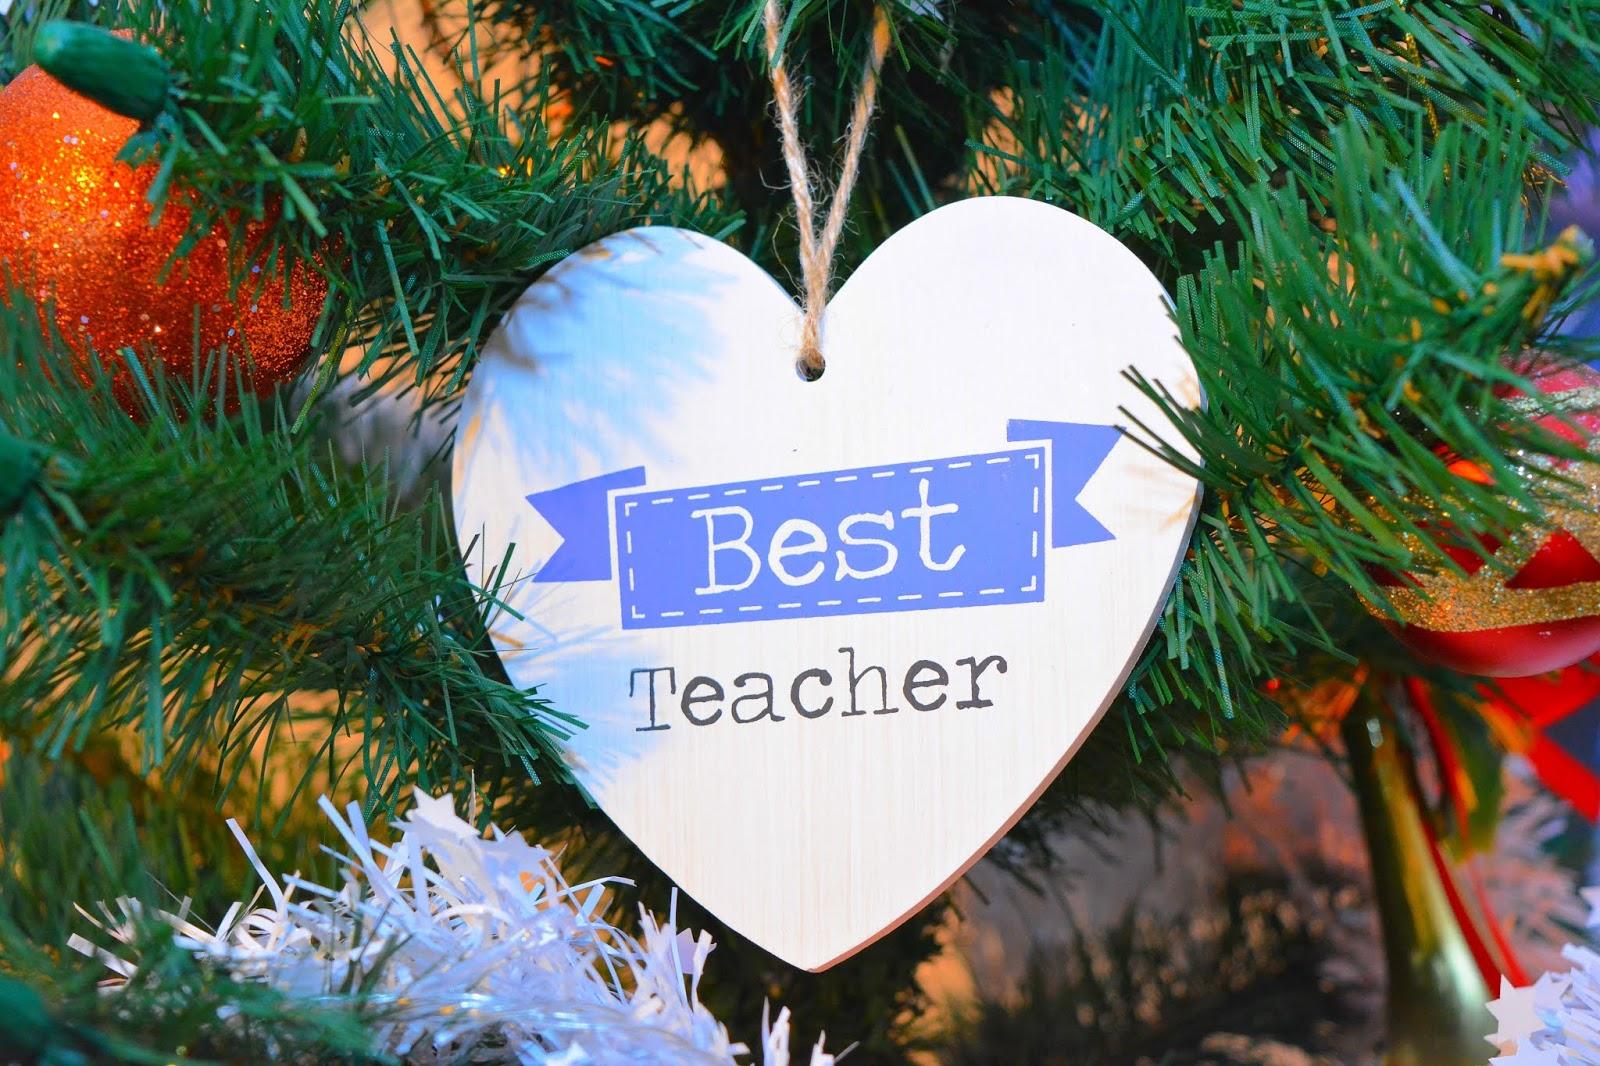 Pesan Untuk Para Guru Yang Harus Diketahui Pesan Untuk Para Guru Yang Harus Diketahui, Biar Kerja Lebih Semangat